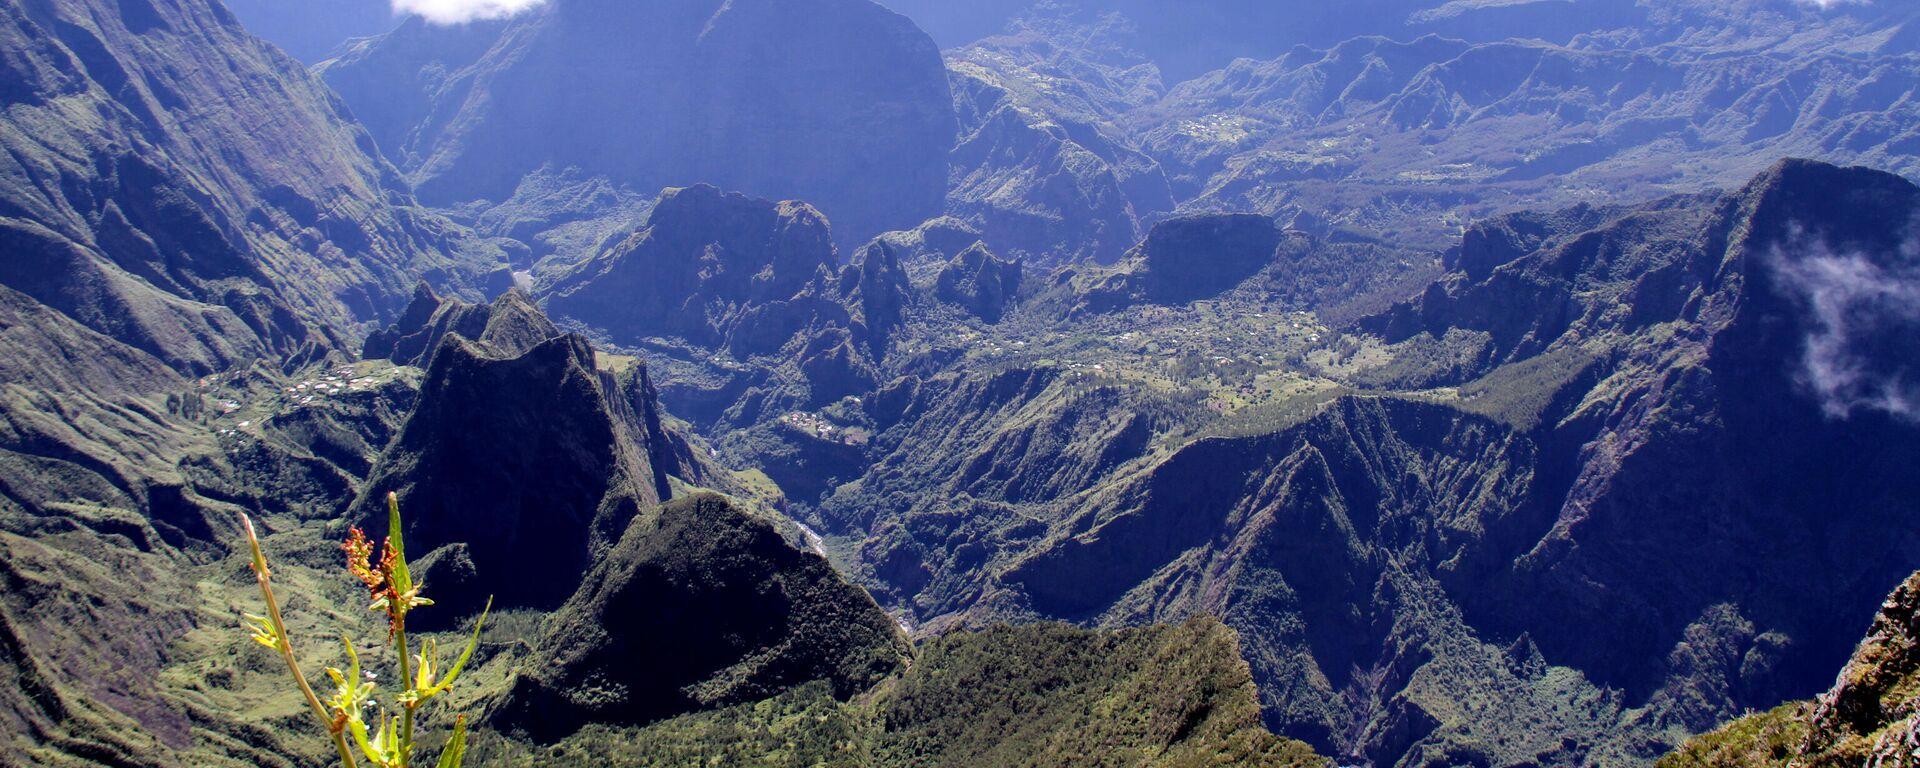 Insel Réunion  - SNA, 1920, 11.10.2021